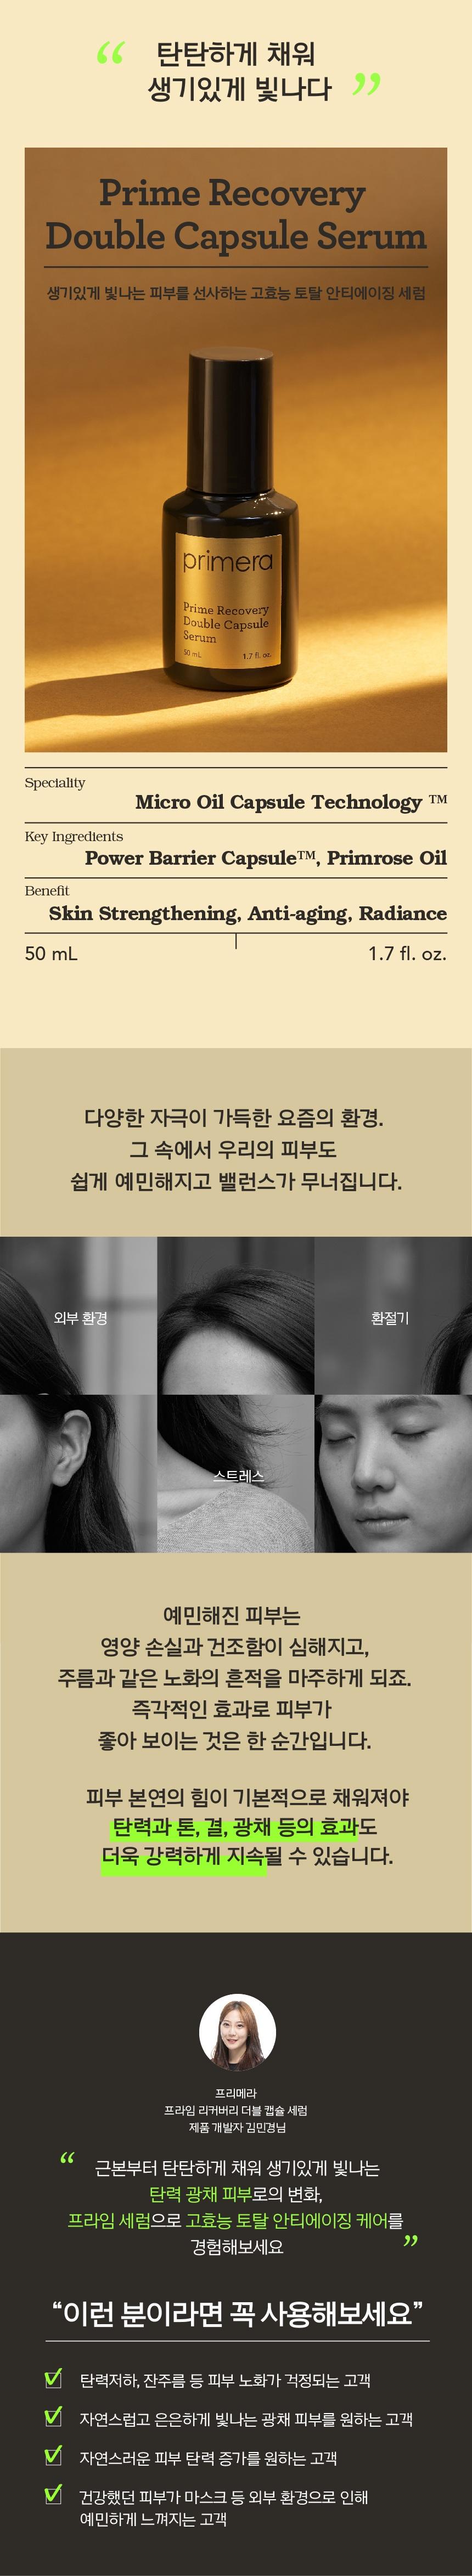 primera Prime Recovery Double Capsule Serum korean skincare prduct online shop malaysia sweden macau1